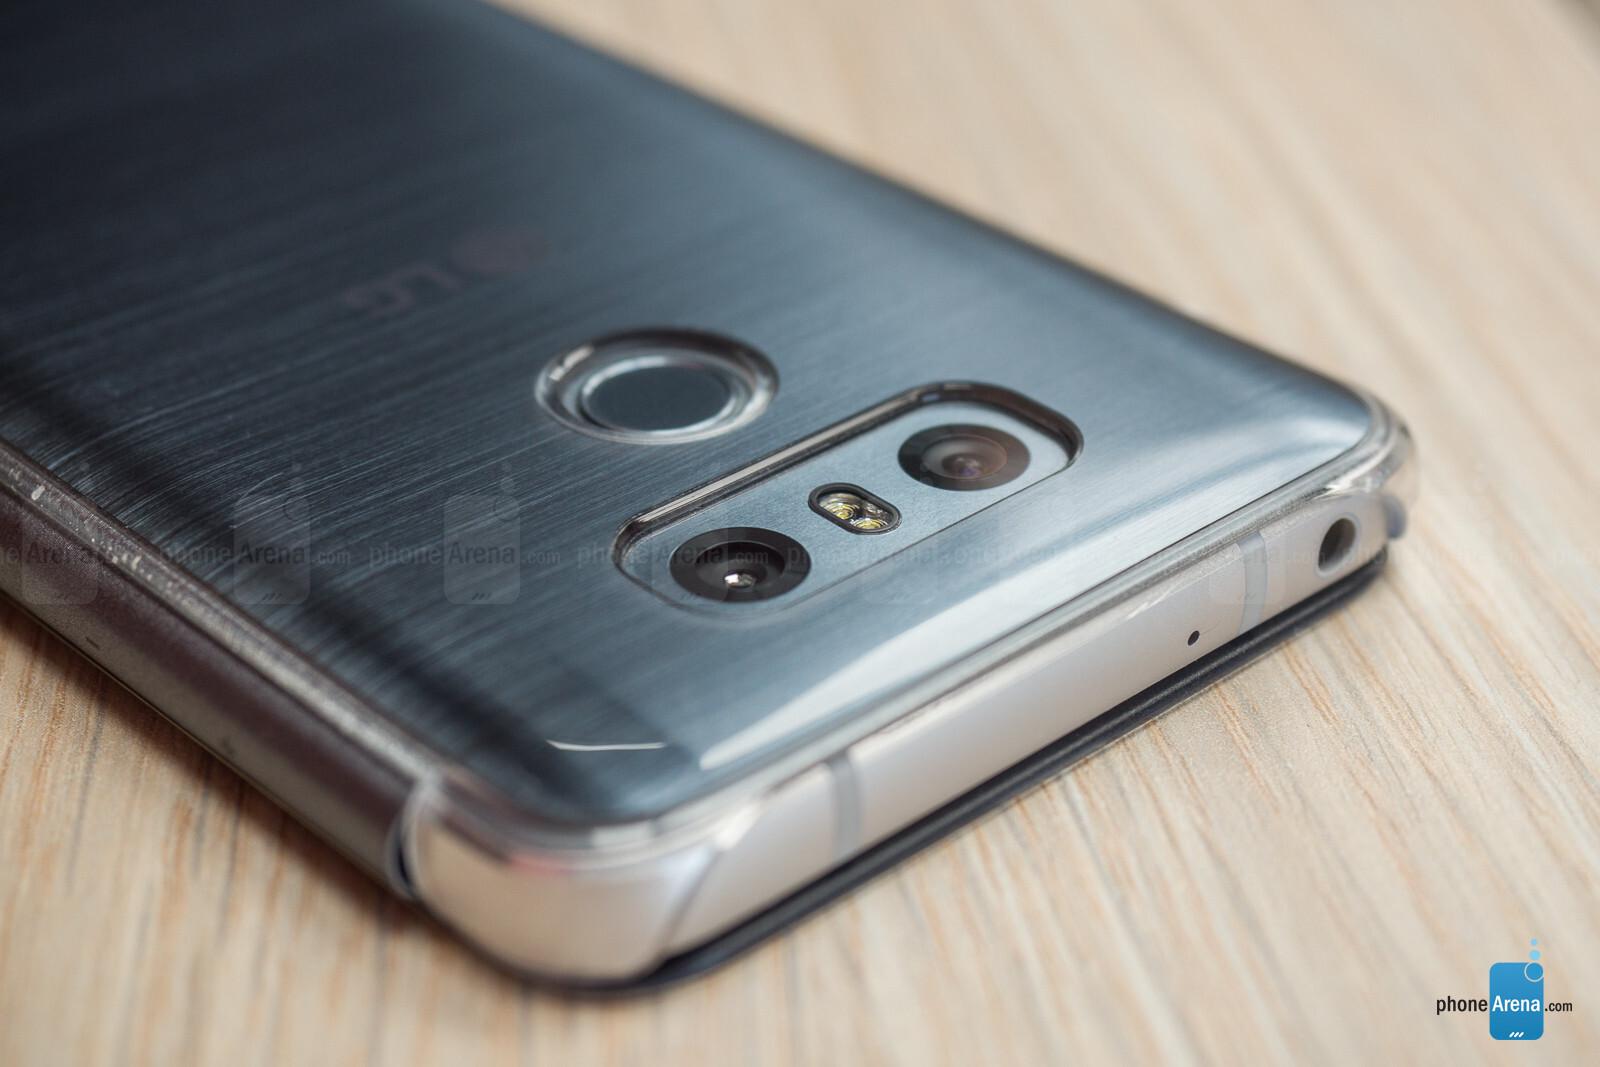 LG G6 Quick Cover Flip Case Review